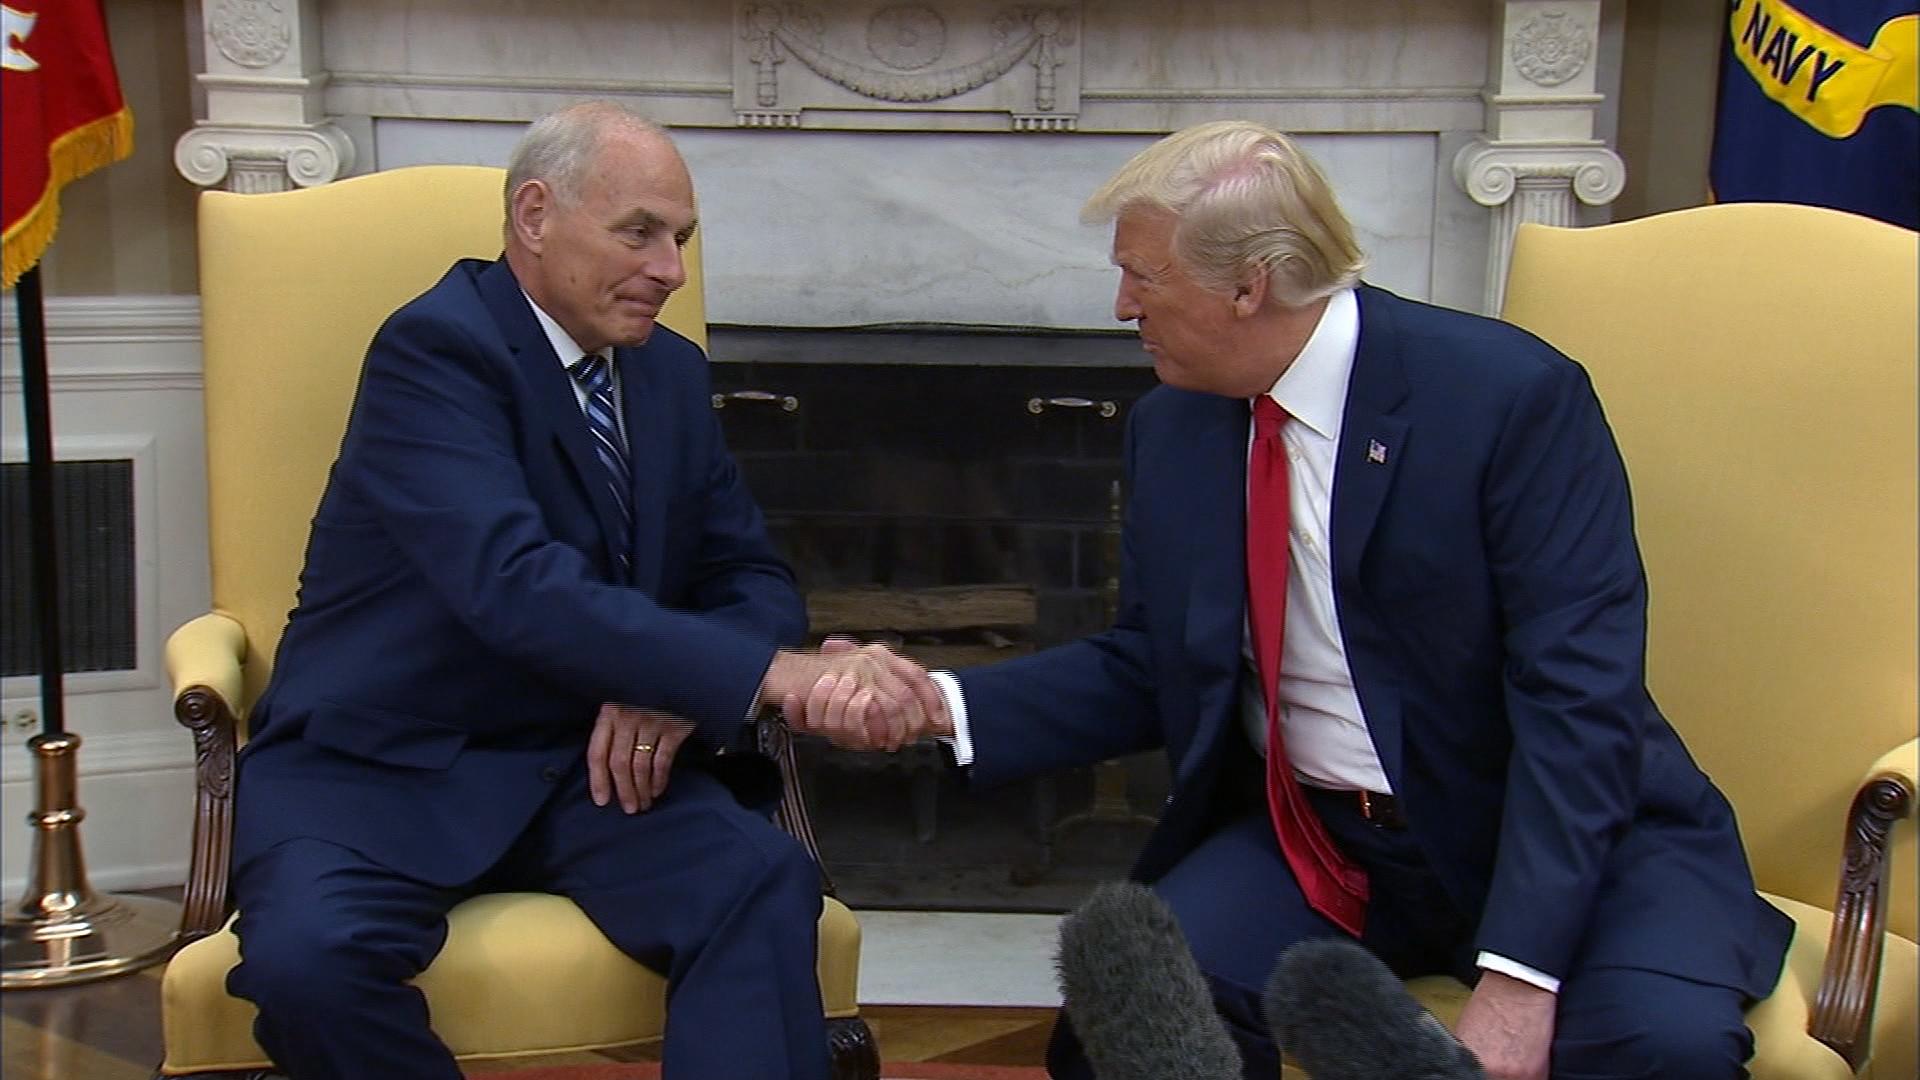 Donald Trump and John Kelly shake hands-159532.jpg74022797